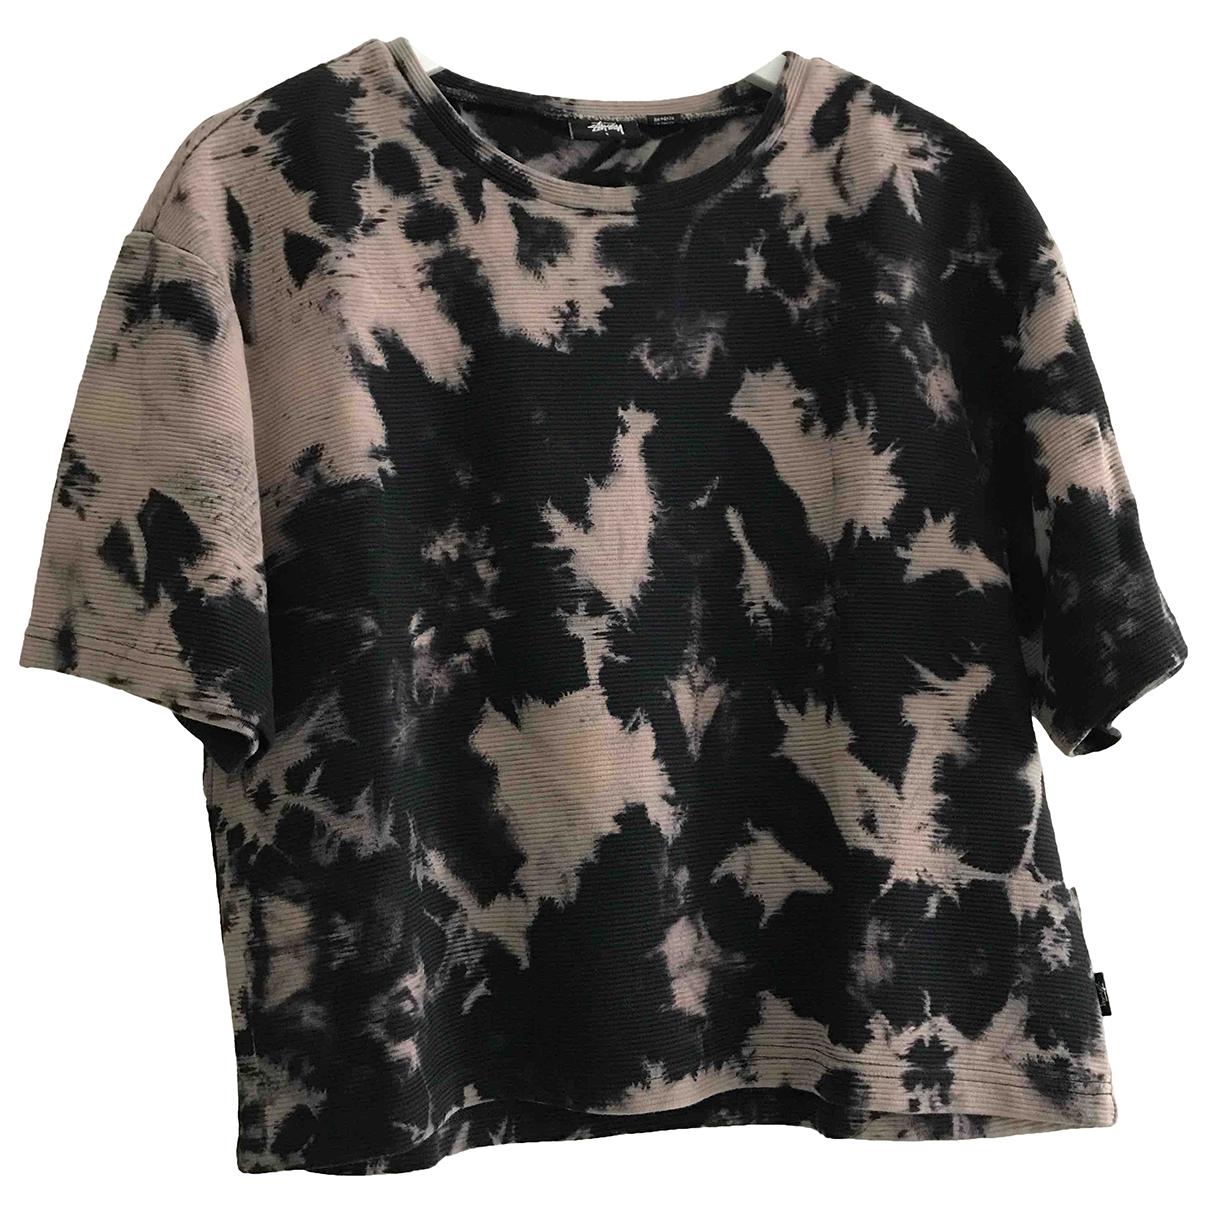 Stussy \N Black Cotton  top for Women S International